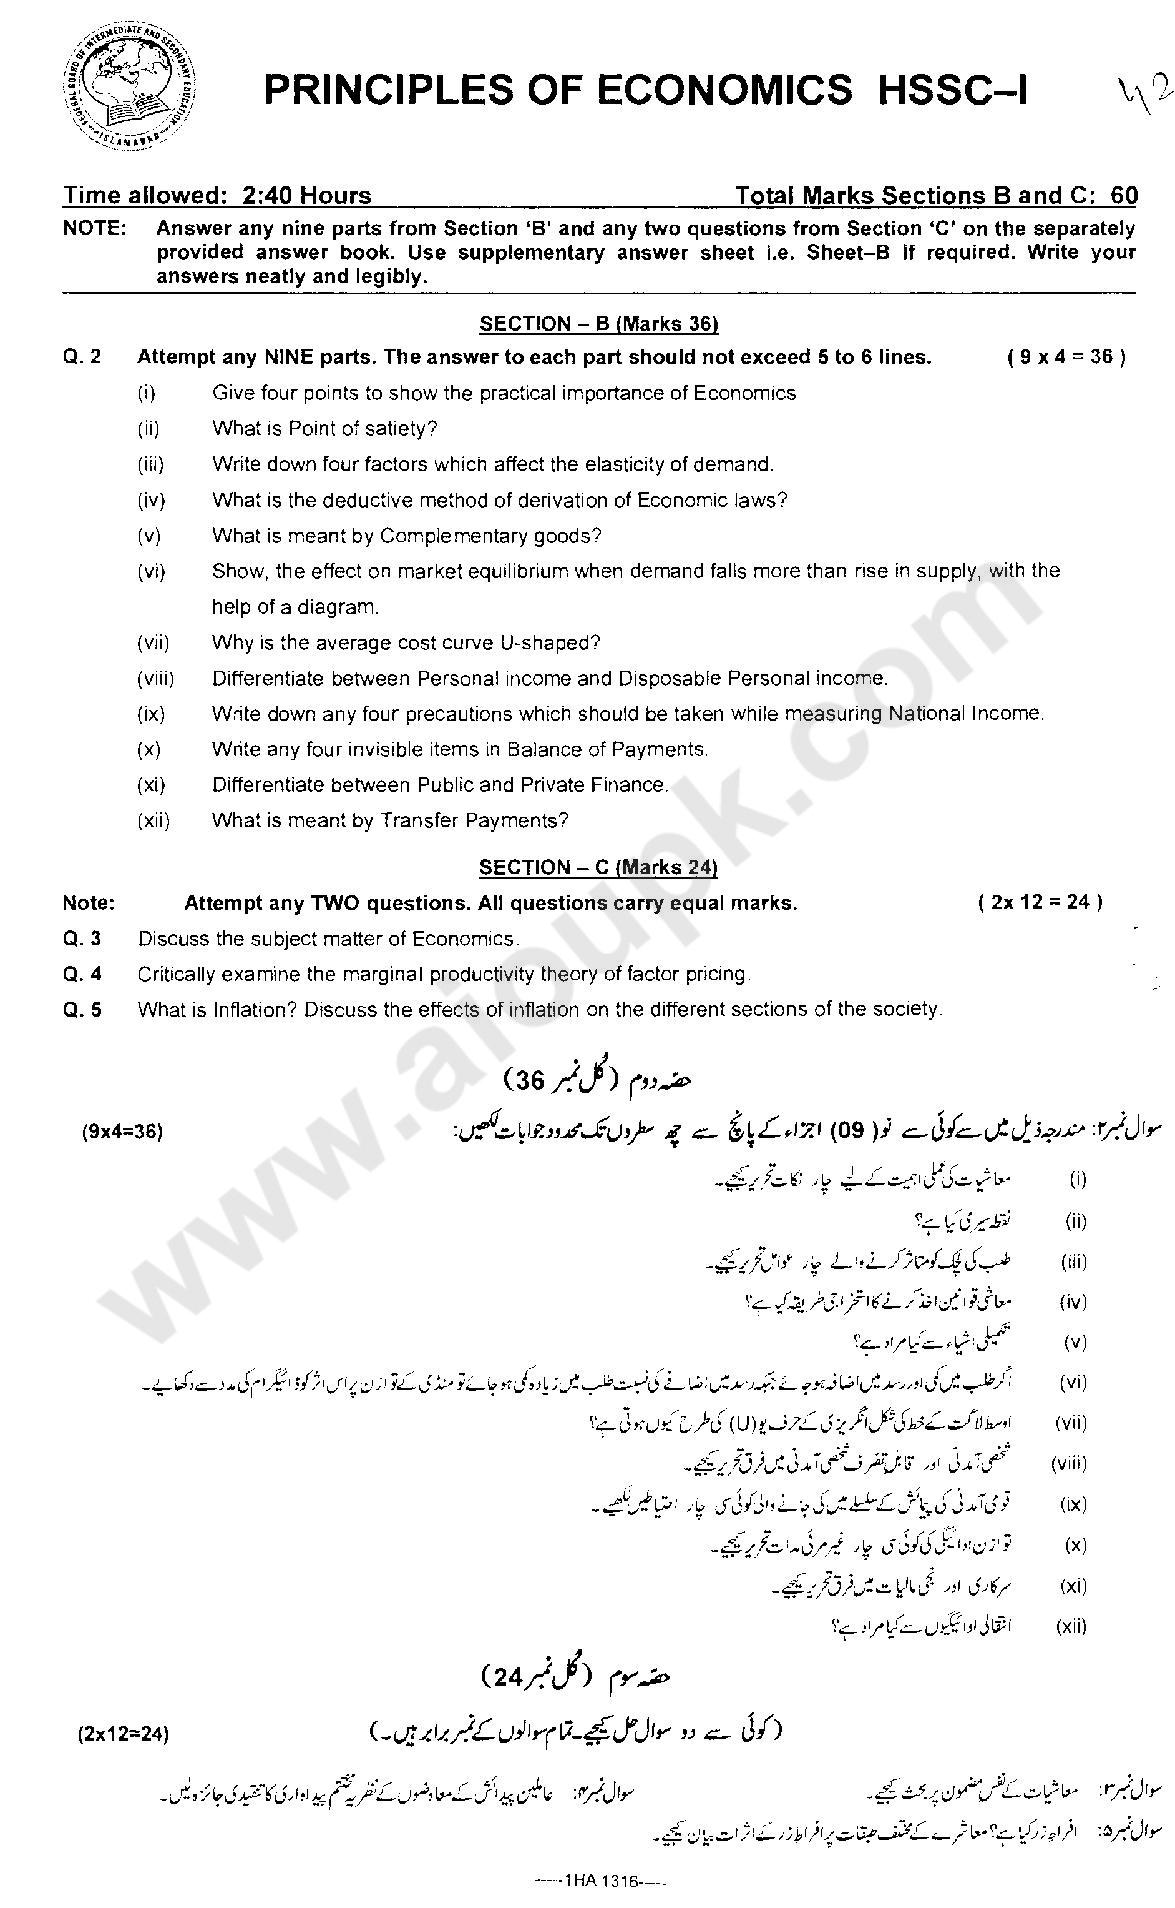 BIE Telangana – Bridge Course Syllabus & Model Question Papers PDF Download